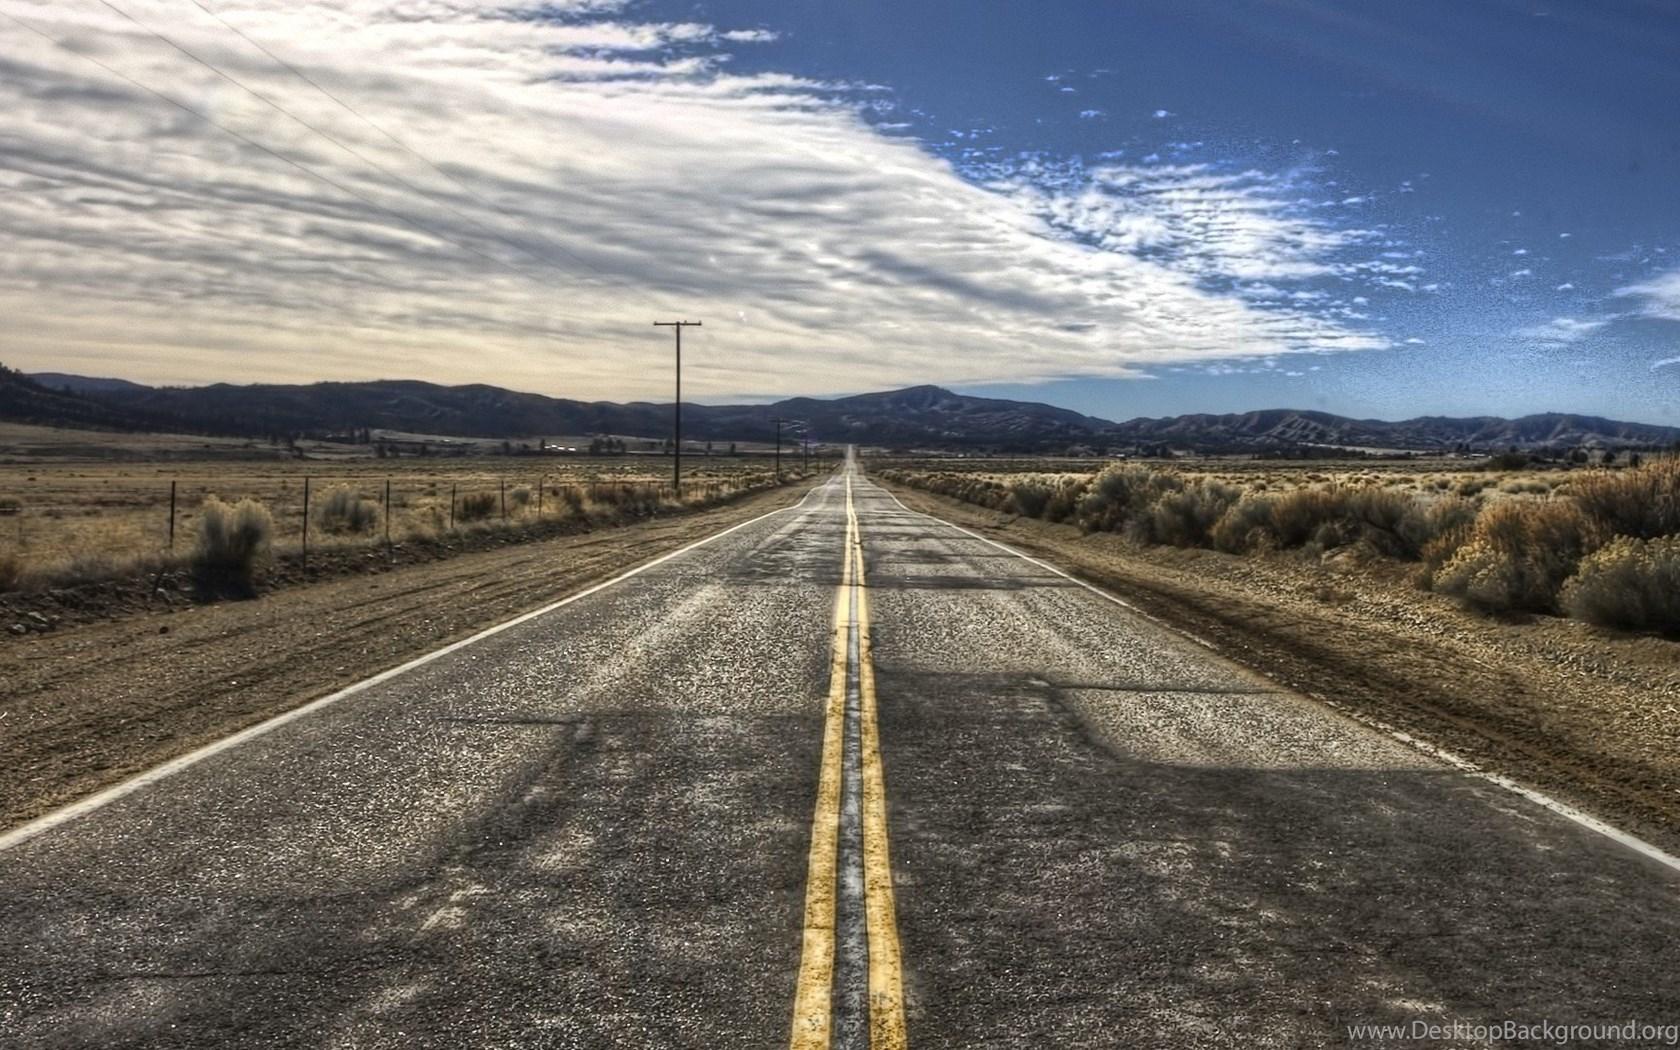 Full Hd Wallpapers Desert Cloud Road Desktop Backgrounds Hd 1080p